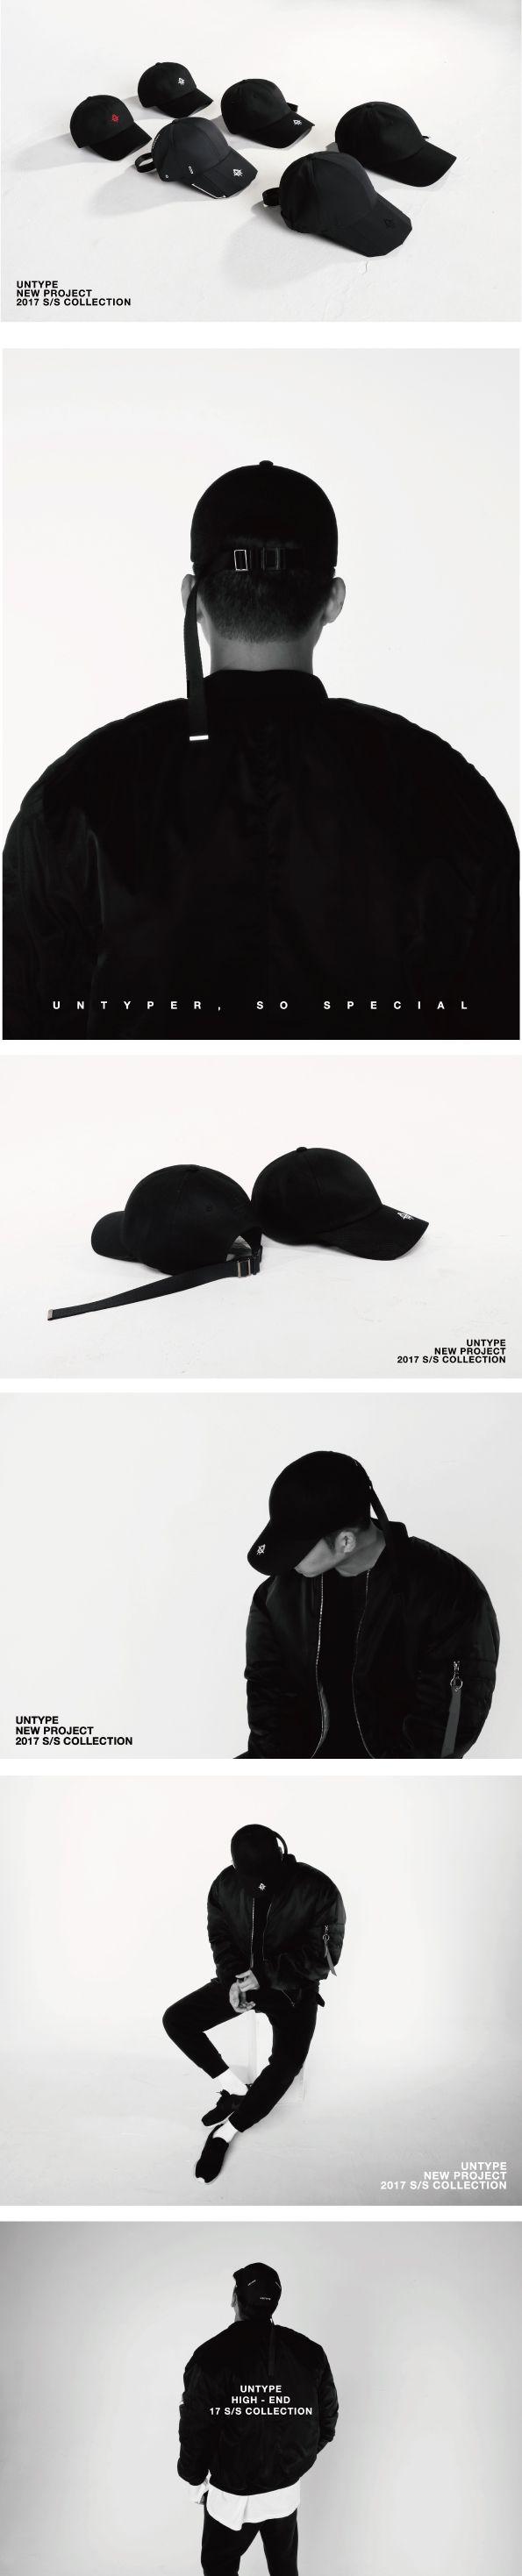 UNTYPE [언타입]  남다른 특별함의 가치 untyper so, special  NEW CAP PRODUCT 2017 S/S COLLECTION LOOKBOOK    #패션 #디자이너 #브랜드 #여름 #신상 #제품 #모자 #볼캡 #디자인 #스트릿 #힙합 #래퍼 #fashion #designer #brand #summer #product #cap #design #ballcap #street #hiphop #rapper